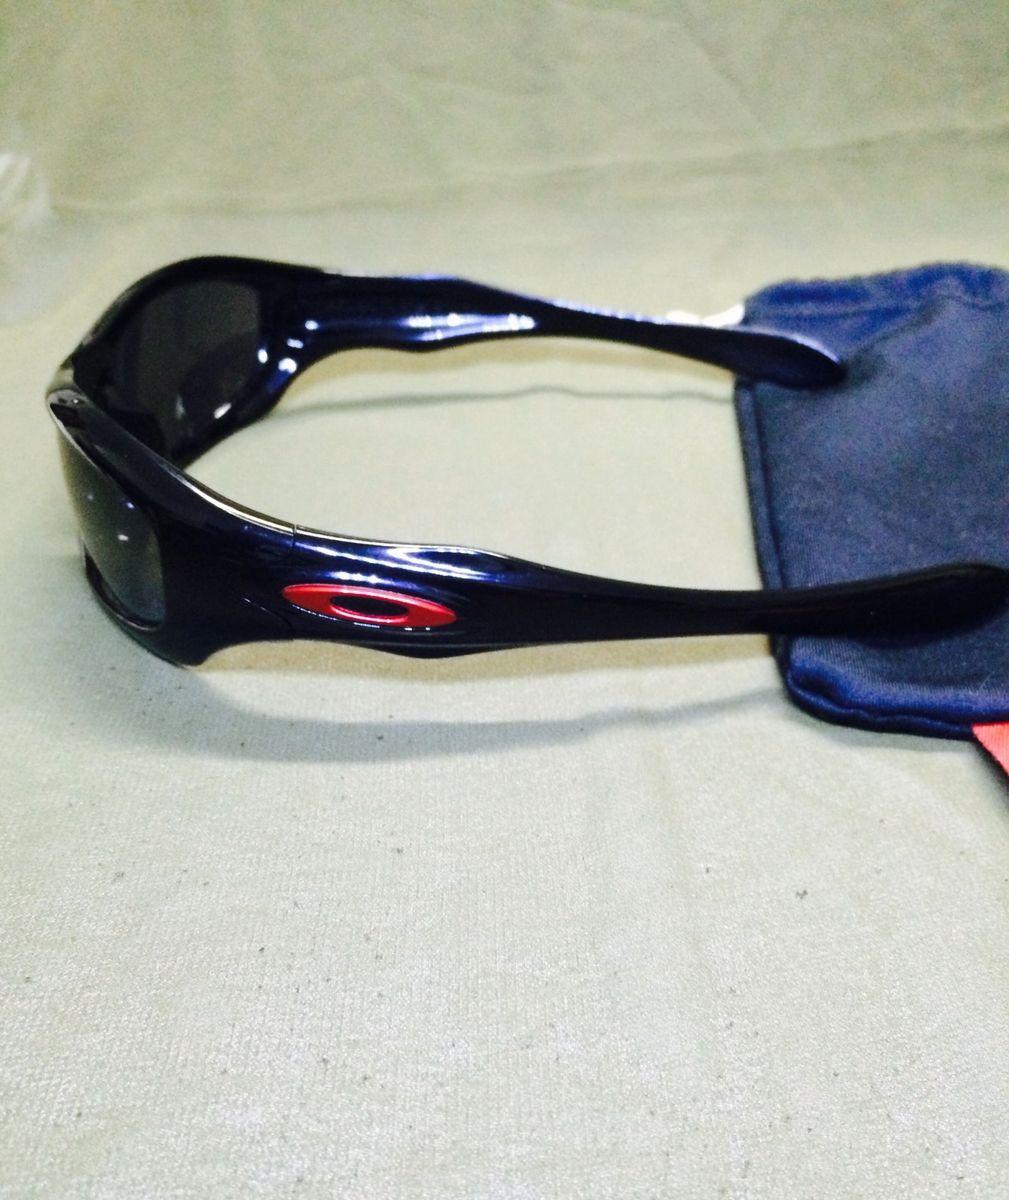 8d7a15bf99 oakley monster dog ducati - óculos oakley.  Czm6ly9wag90b3muzw5qb2vplmnvbs5ici9wcm9kdwn0cy81mdyyodc0lze4yzk1ytlmmgrinjg1odi4odrmmtzhnzvlzdnhm2rllmpwzw